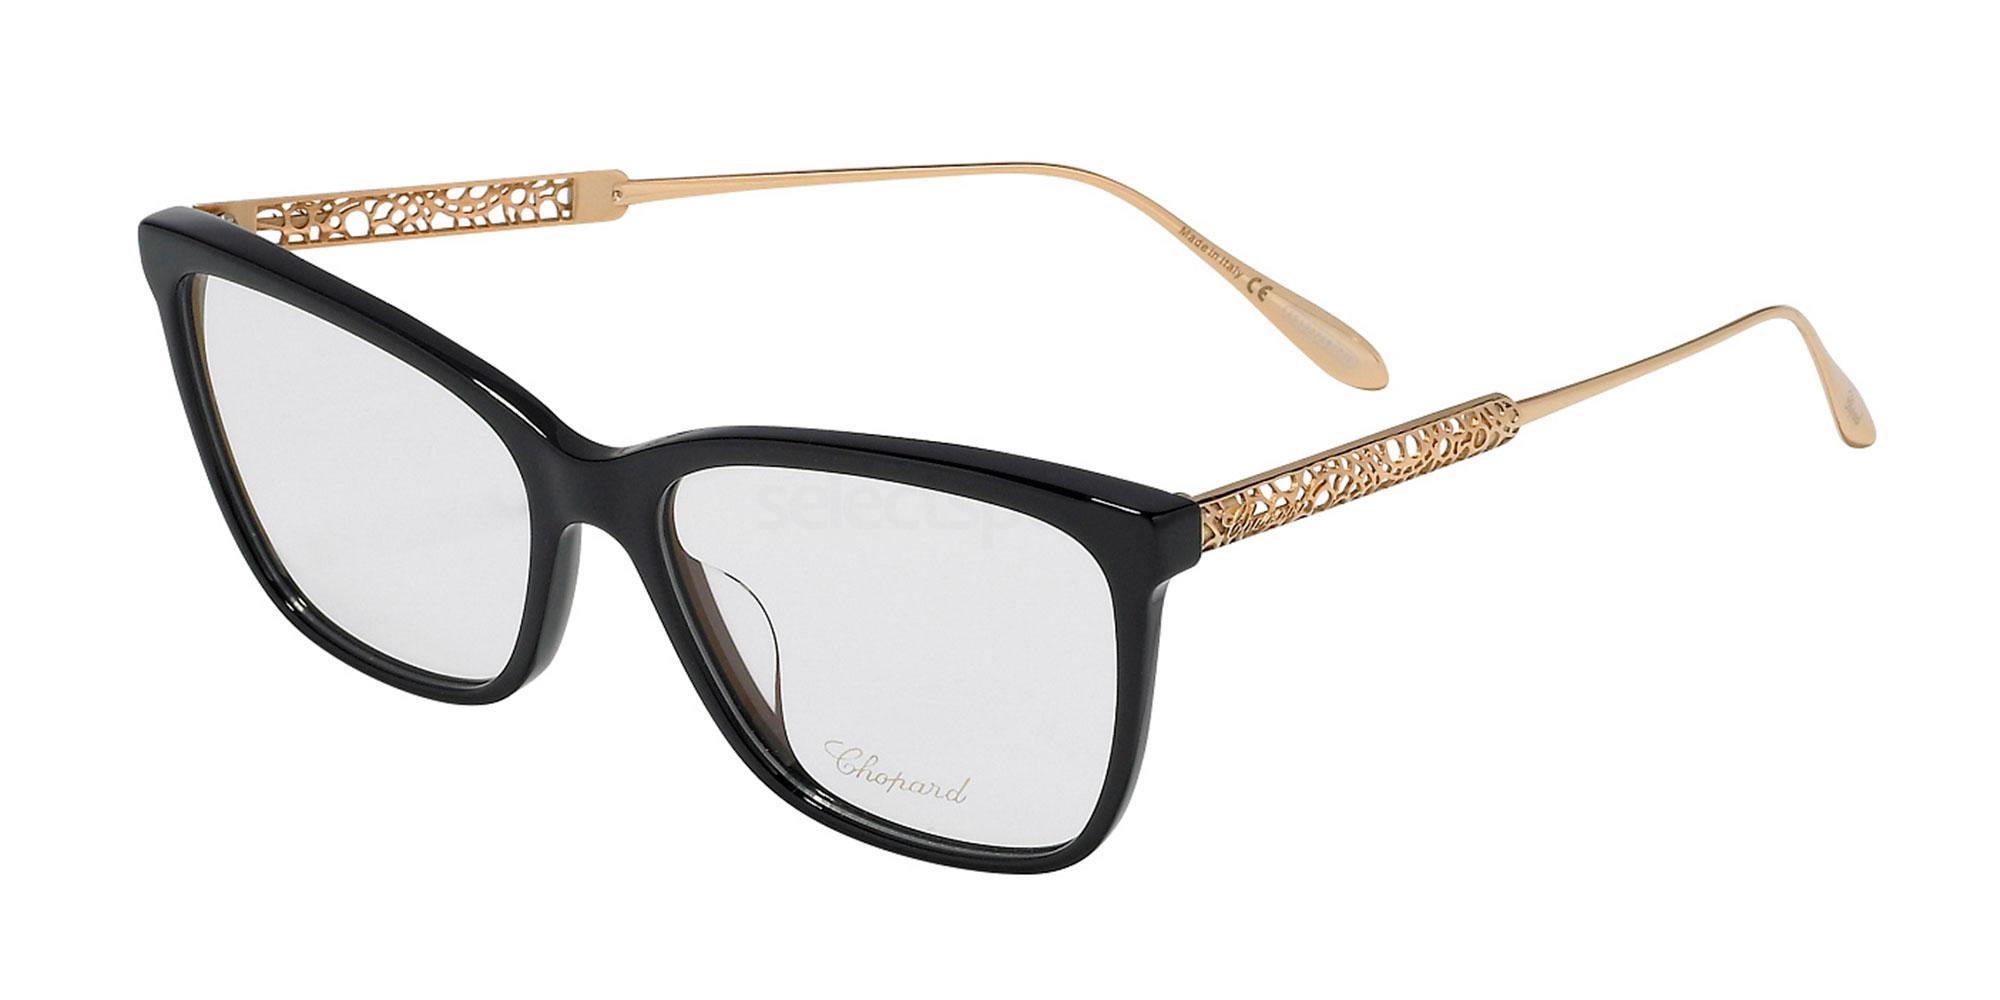 0700 VCH254 Glasses, Chopard